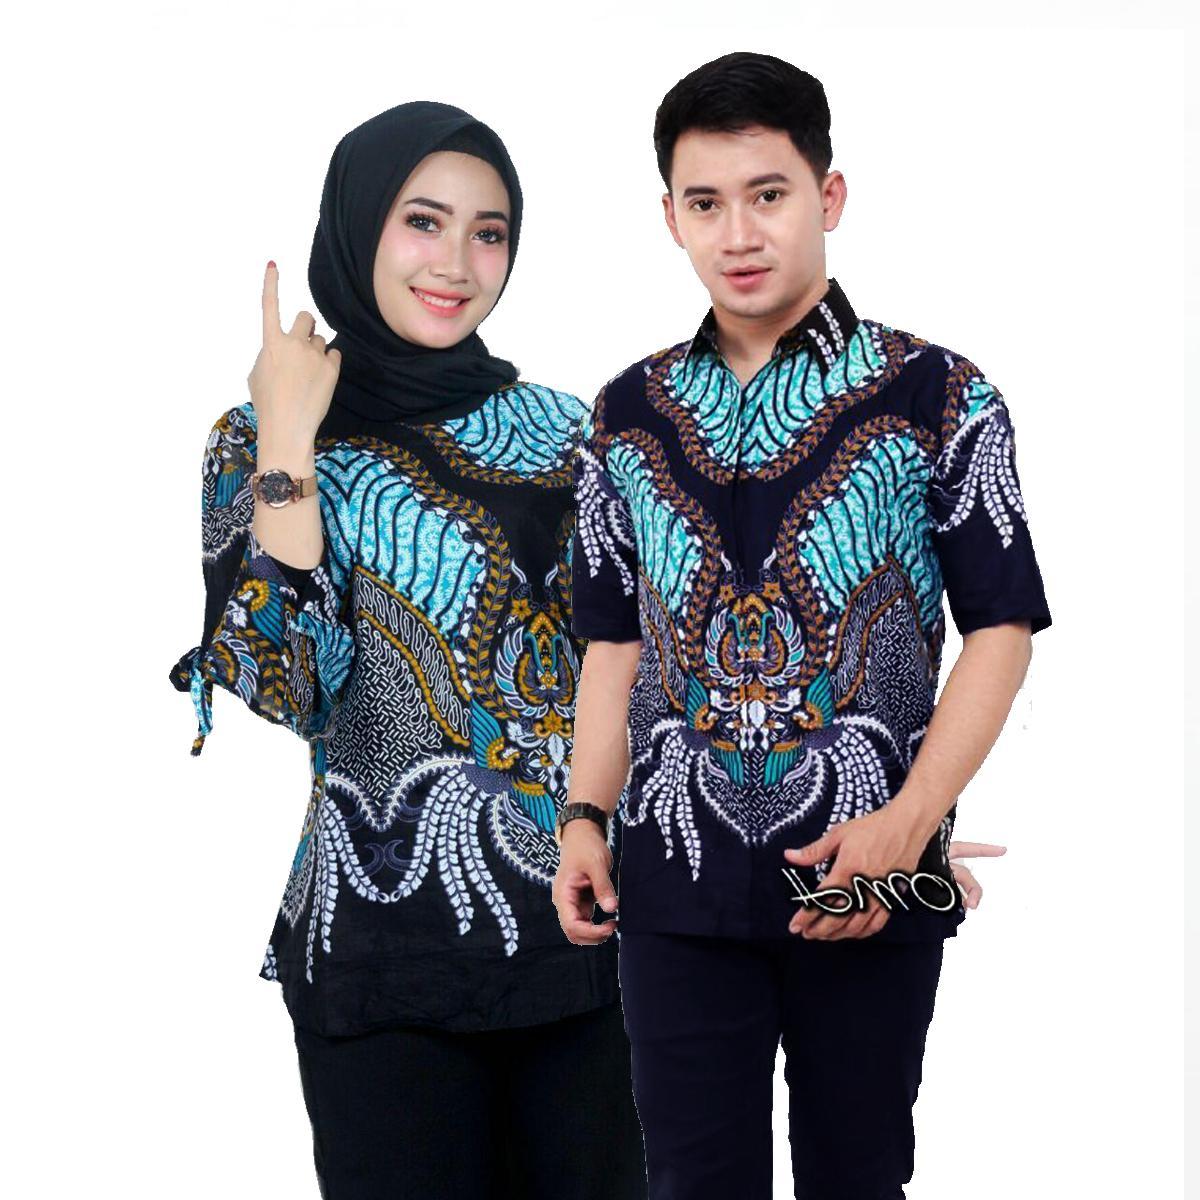 Baju Batik Couple / Couple Batik / Baju Muslim Wanita Terbaru 2019 / Batik Sarimbit / Baju Batik Modern / Batik Kondangan / Batik Keluarga / Batik Pekalongan Tawon